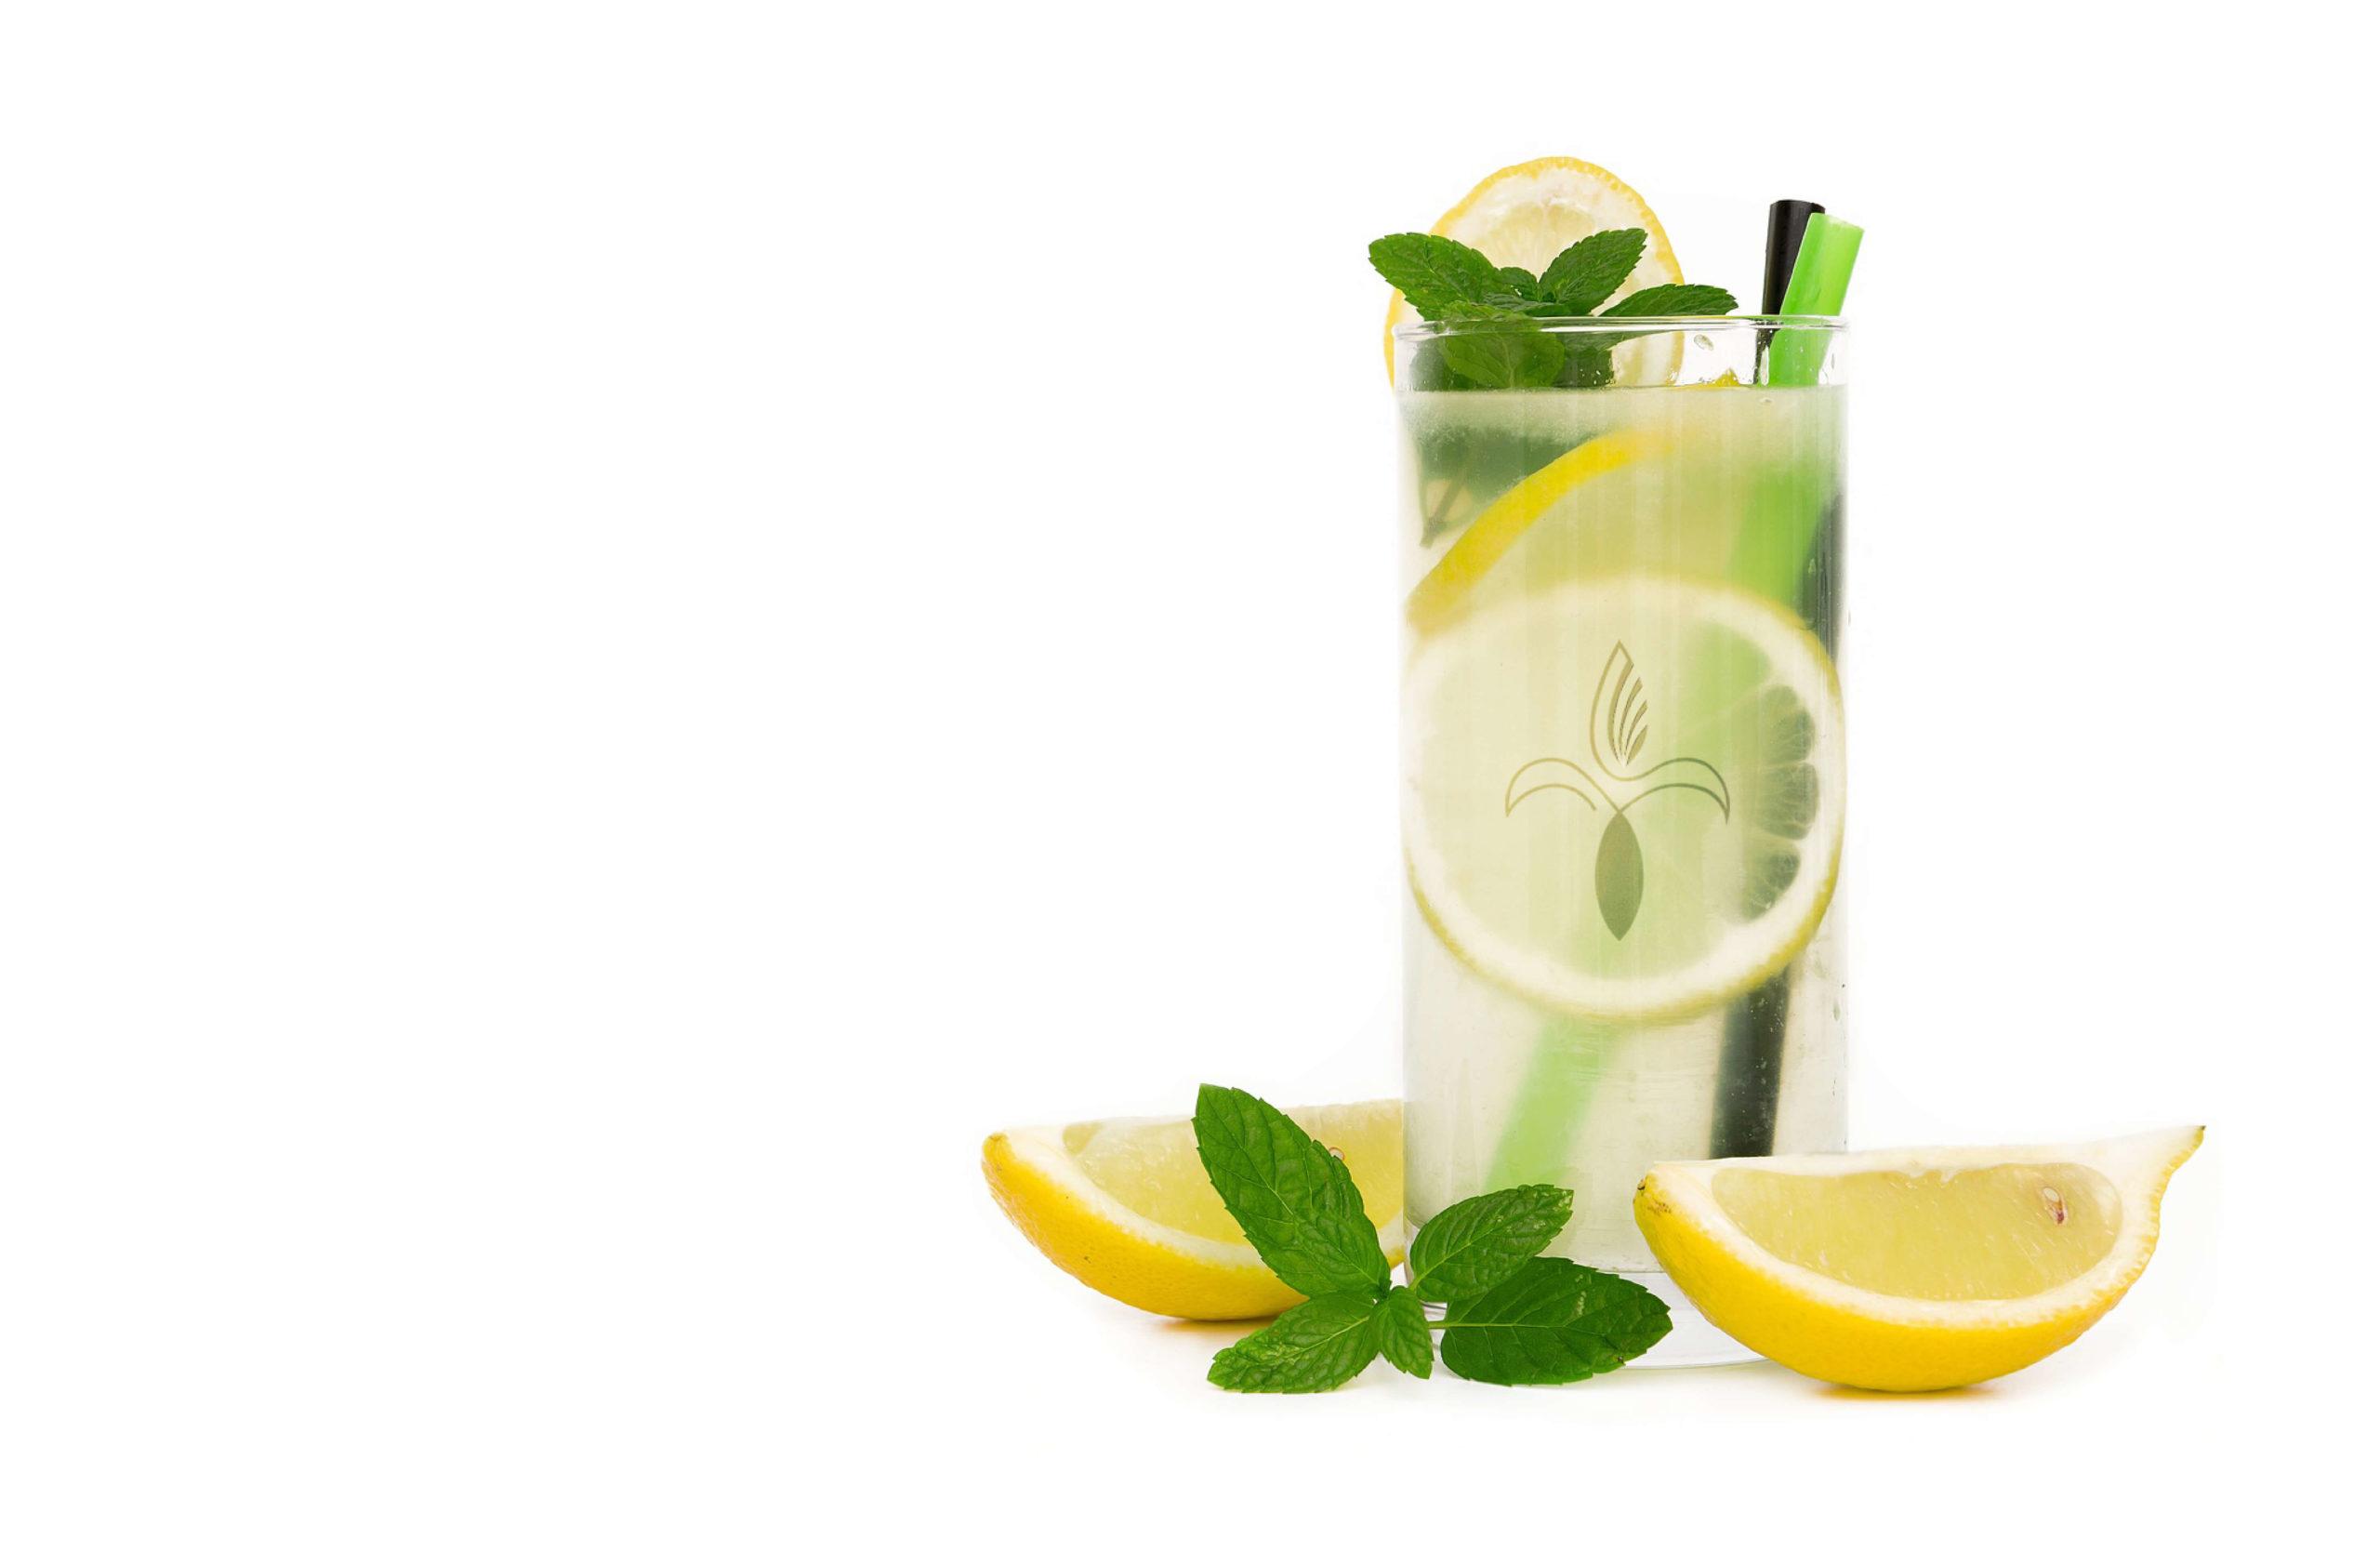 leckere, erfrischende Zitronenlimonade